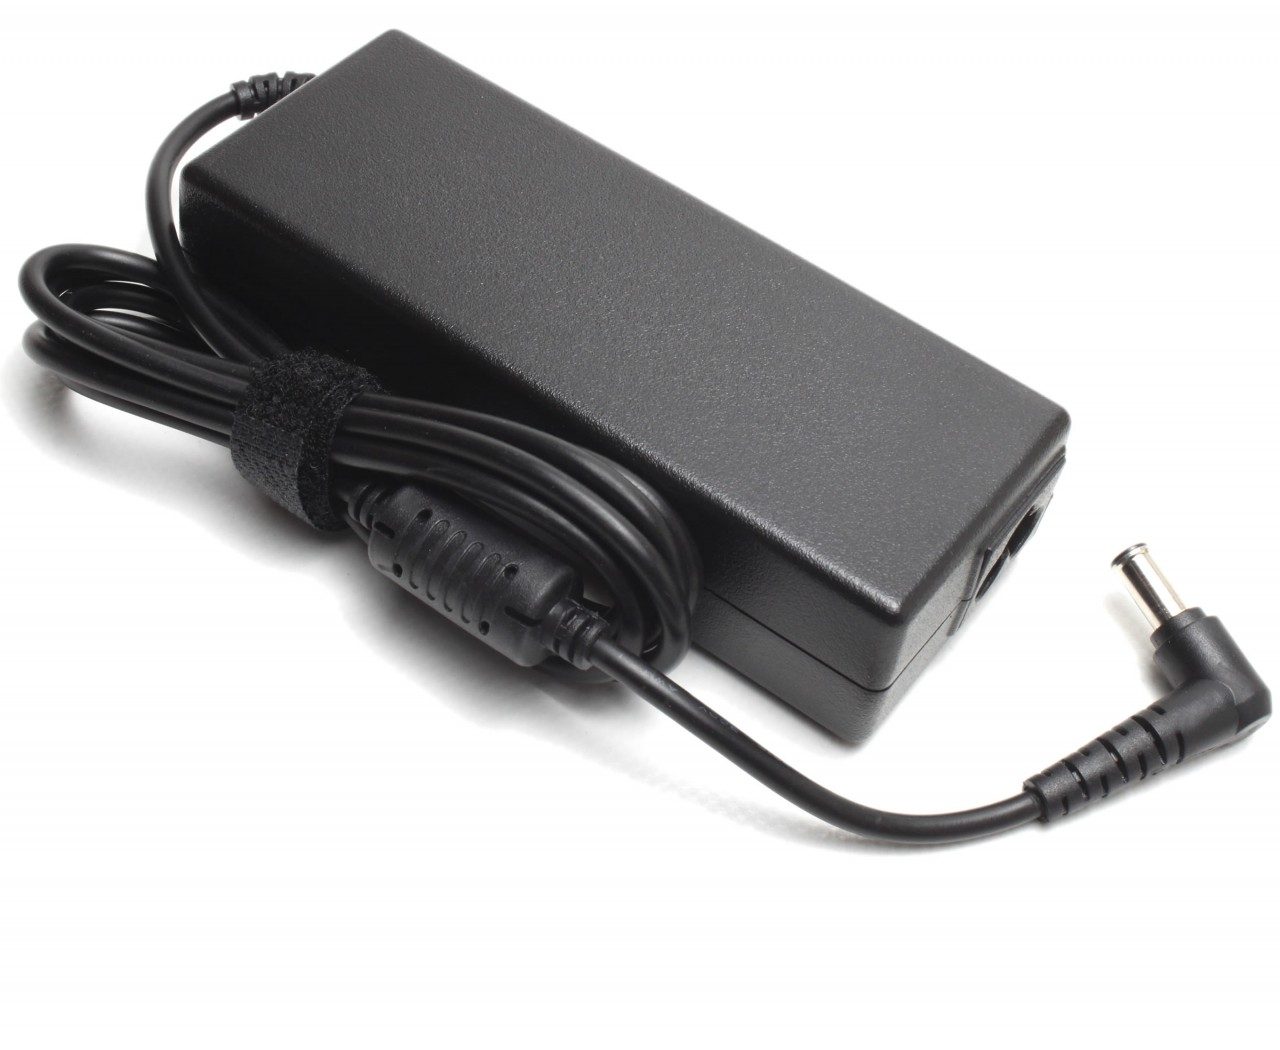 Incarcator Sony Vaio VPCCW2S1EP Replacement imagine